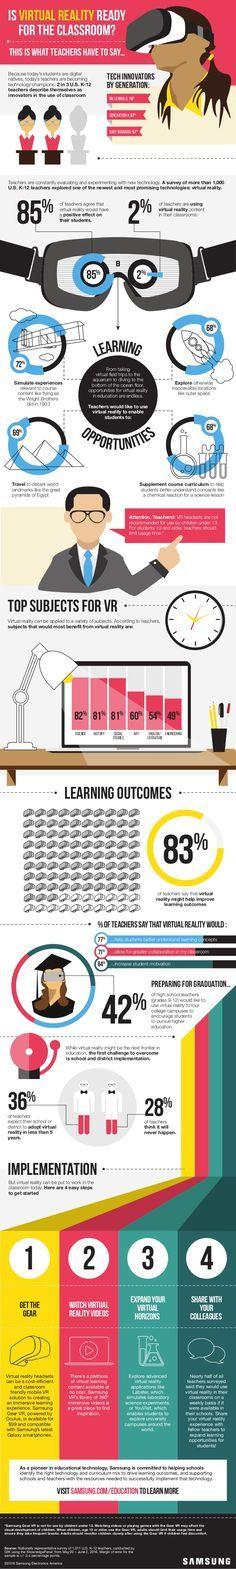 Is Your Classroom Ready for Virtual Reality? @SamsungEdu #VRed #gafe #gsuiteedu #gafechat #googleedu